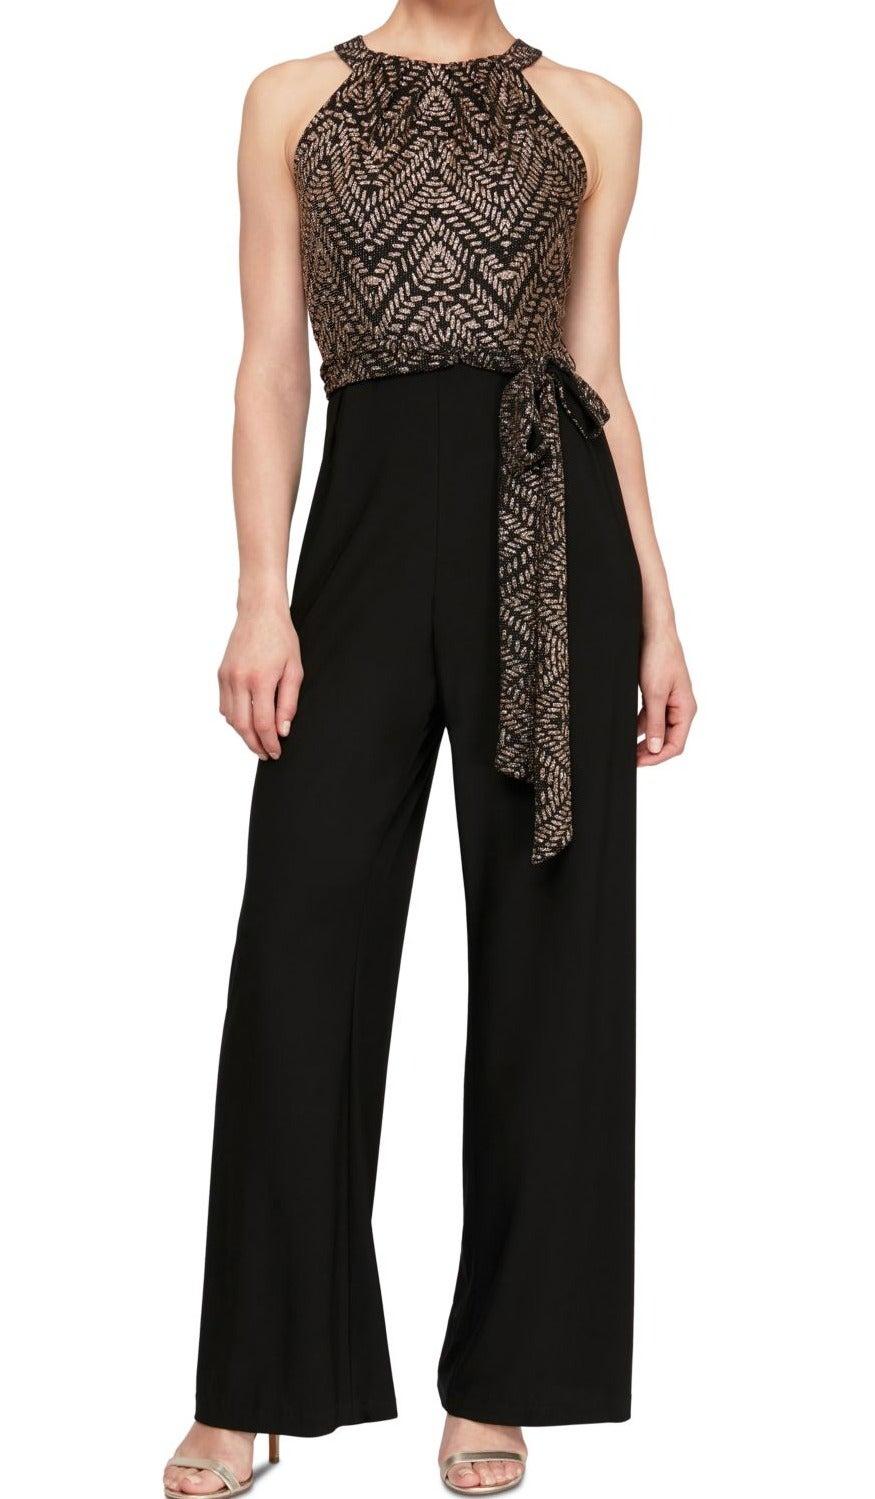 SLNY Women's Jumpsuit Black Gold Size 16 Halter Belted Glitter